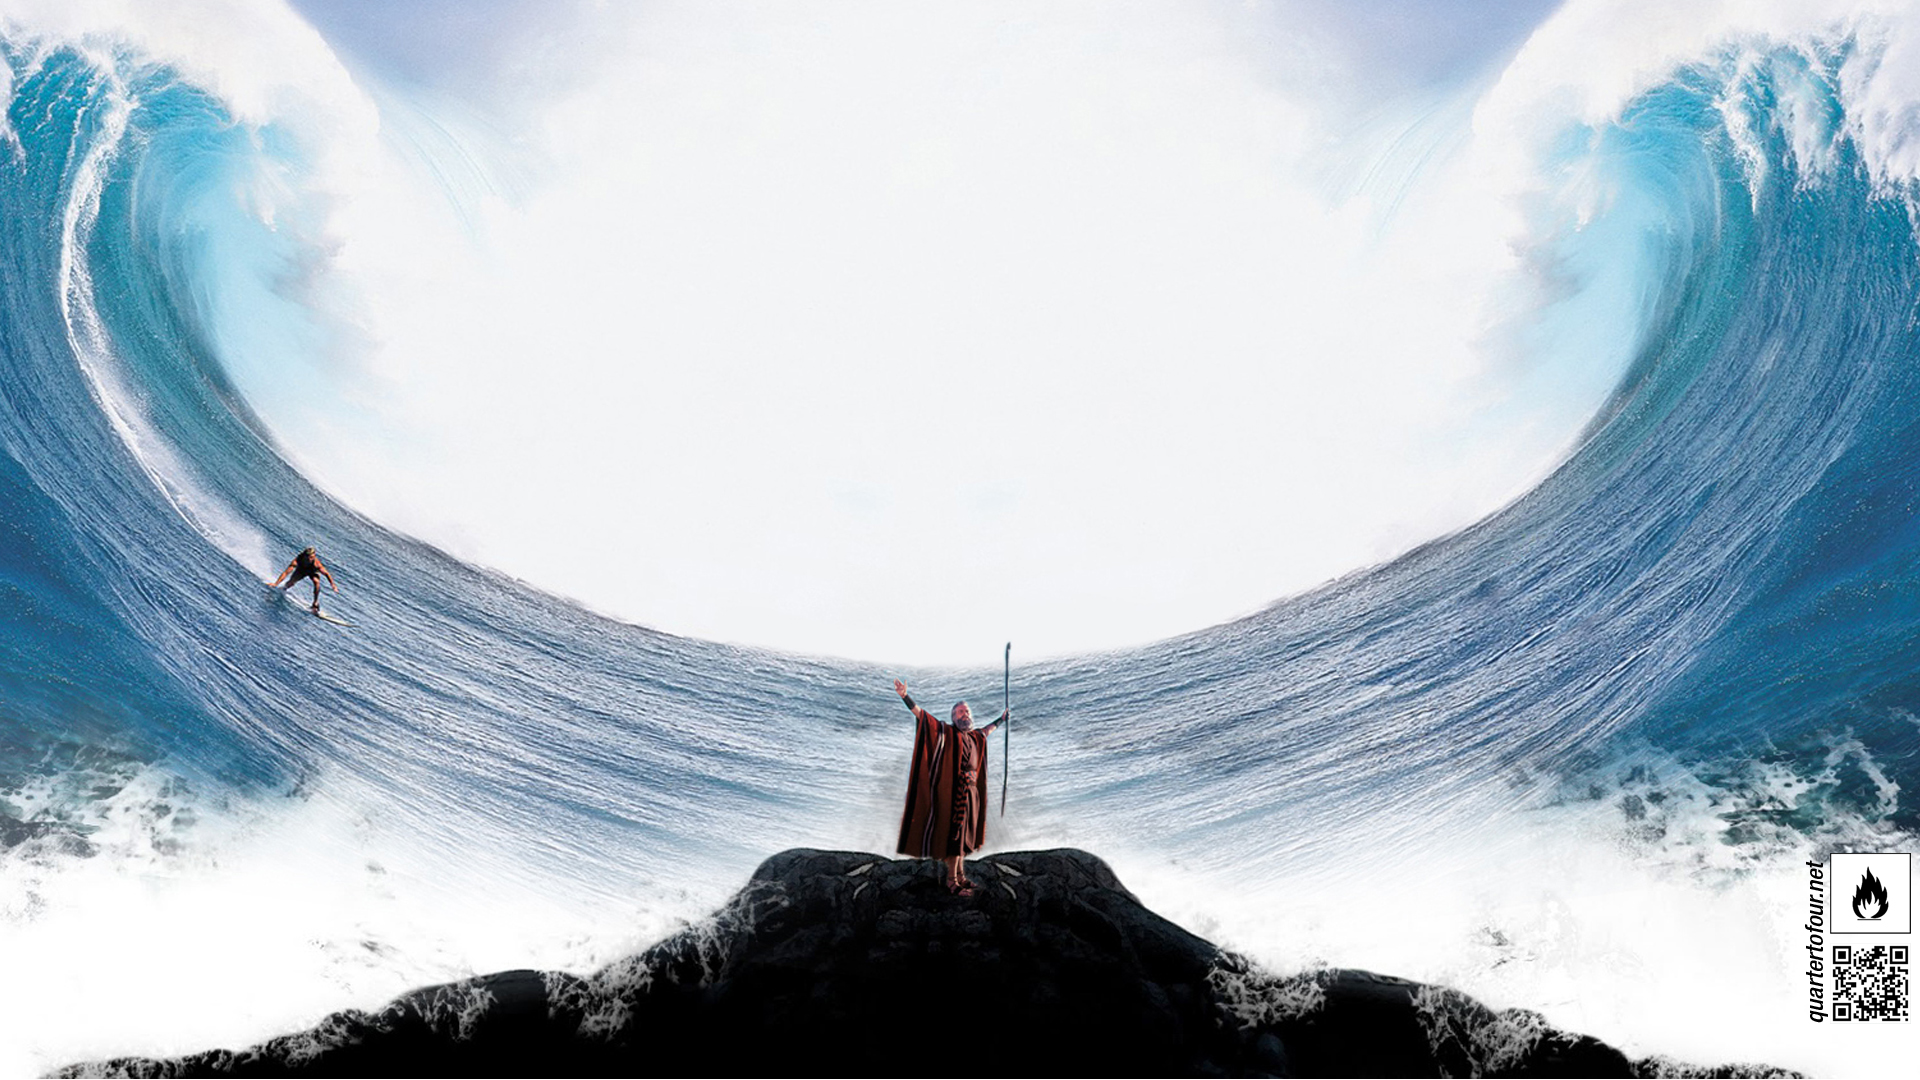 surfing wallpaper 1920x1080 1920x1080